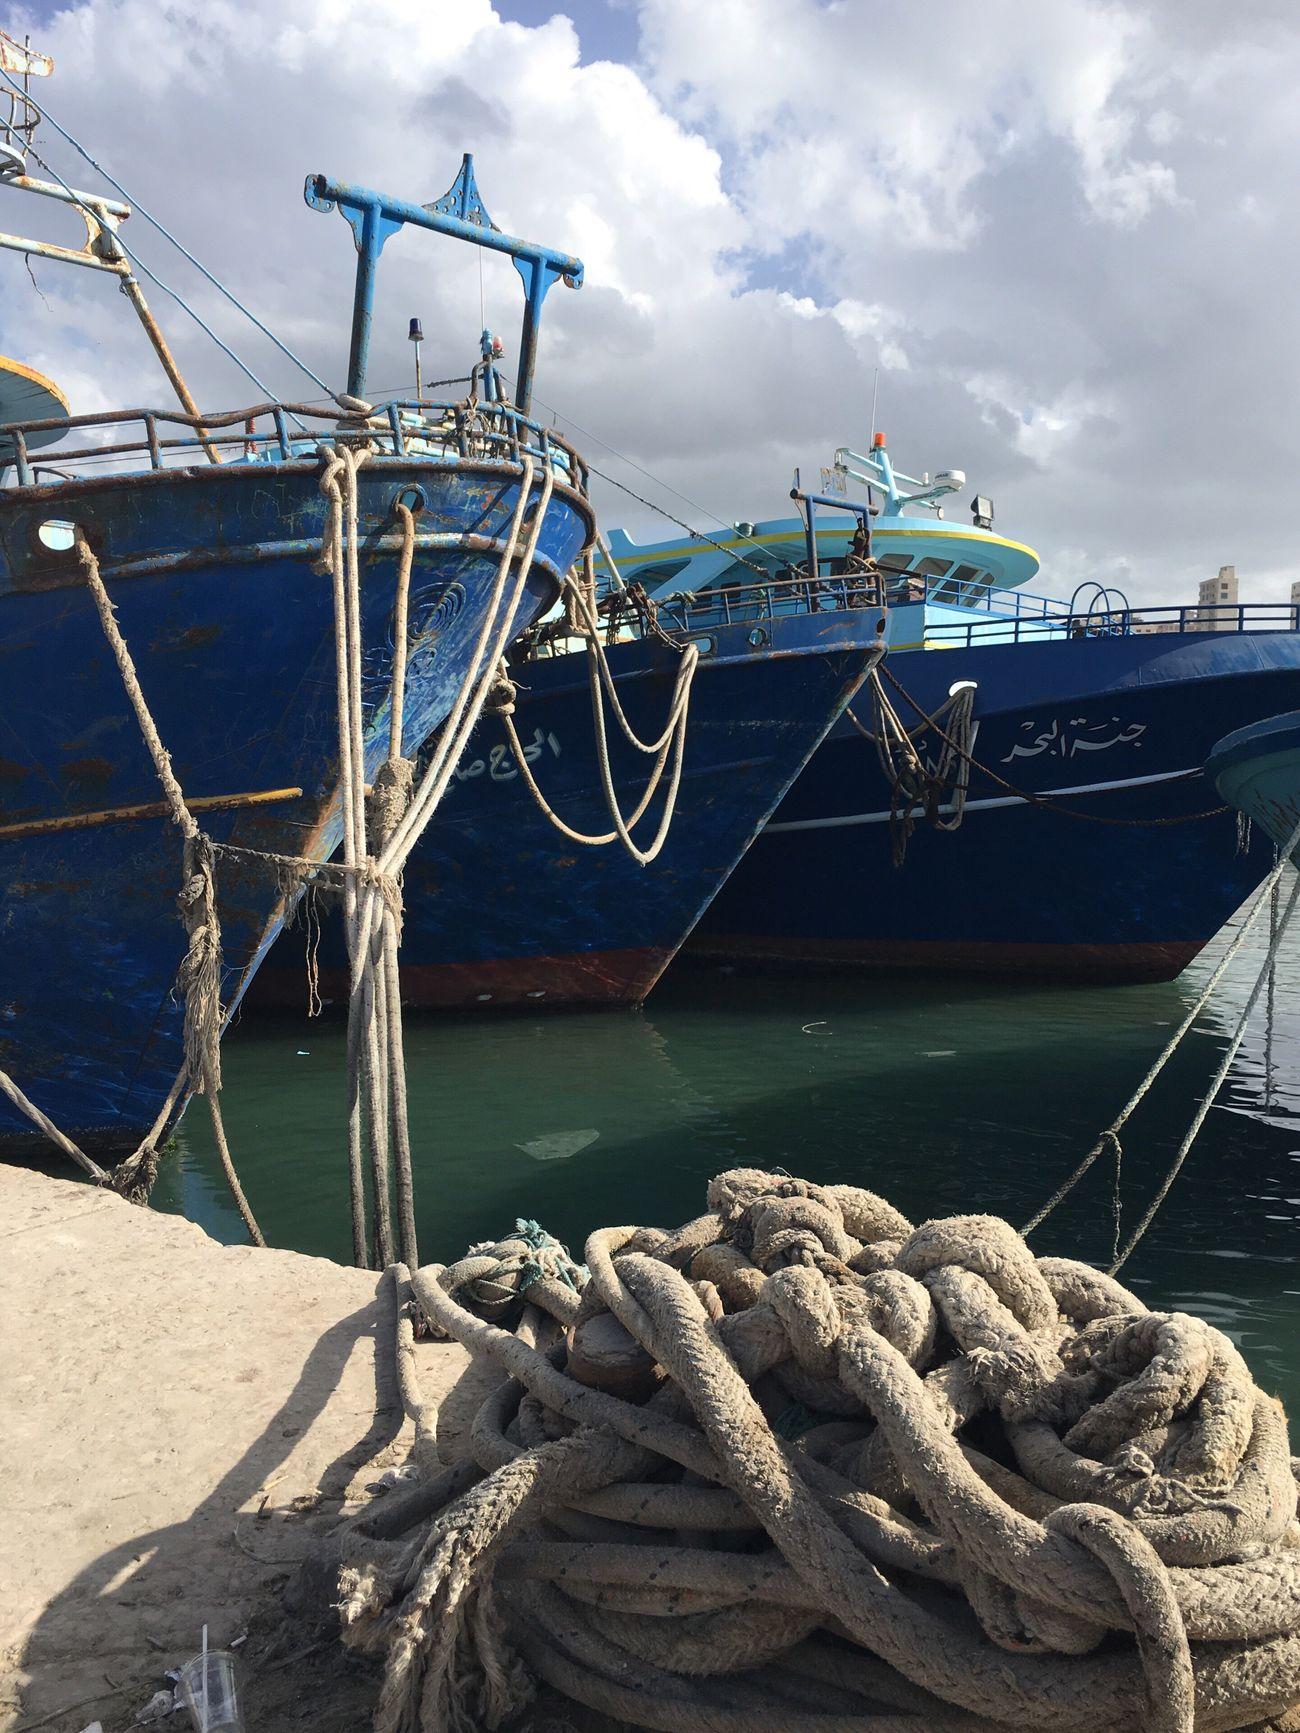 Rope Alexandria Egypt Alexandria Ships Ships⚓️⛵️🚢 Old Rust Rusty Rustic Harbour Sea Sea And Sky Sea Life